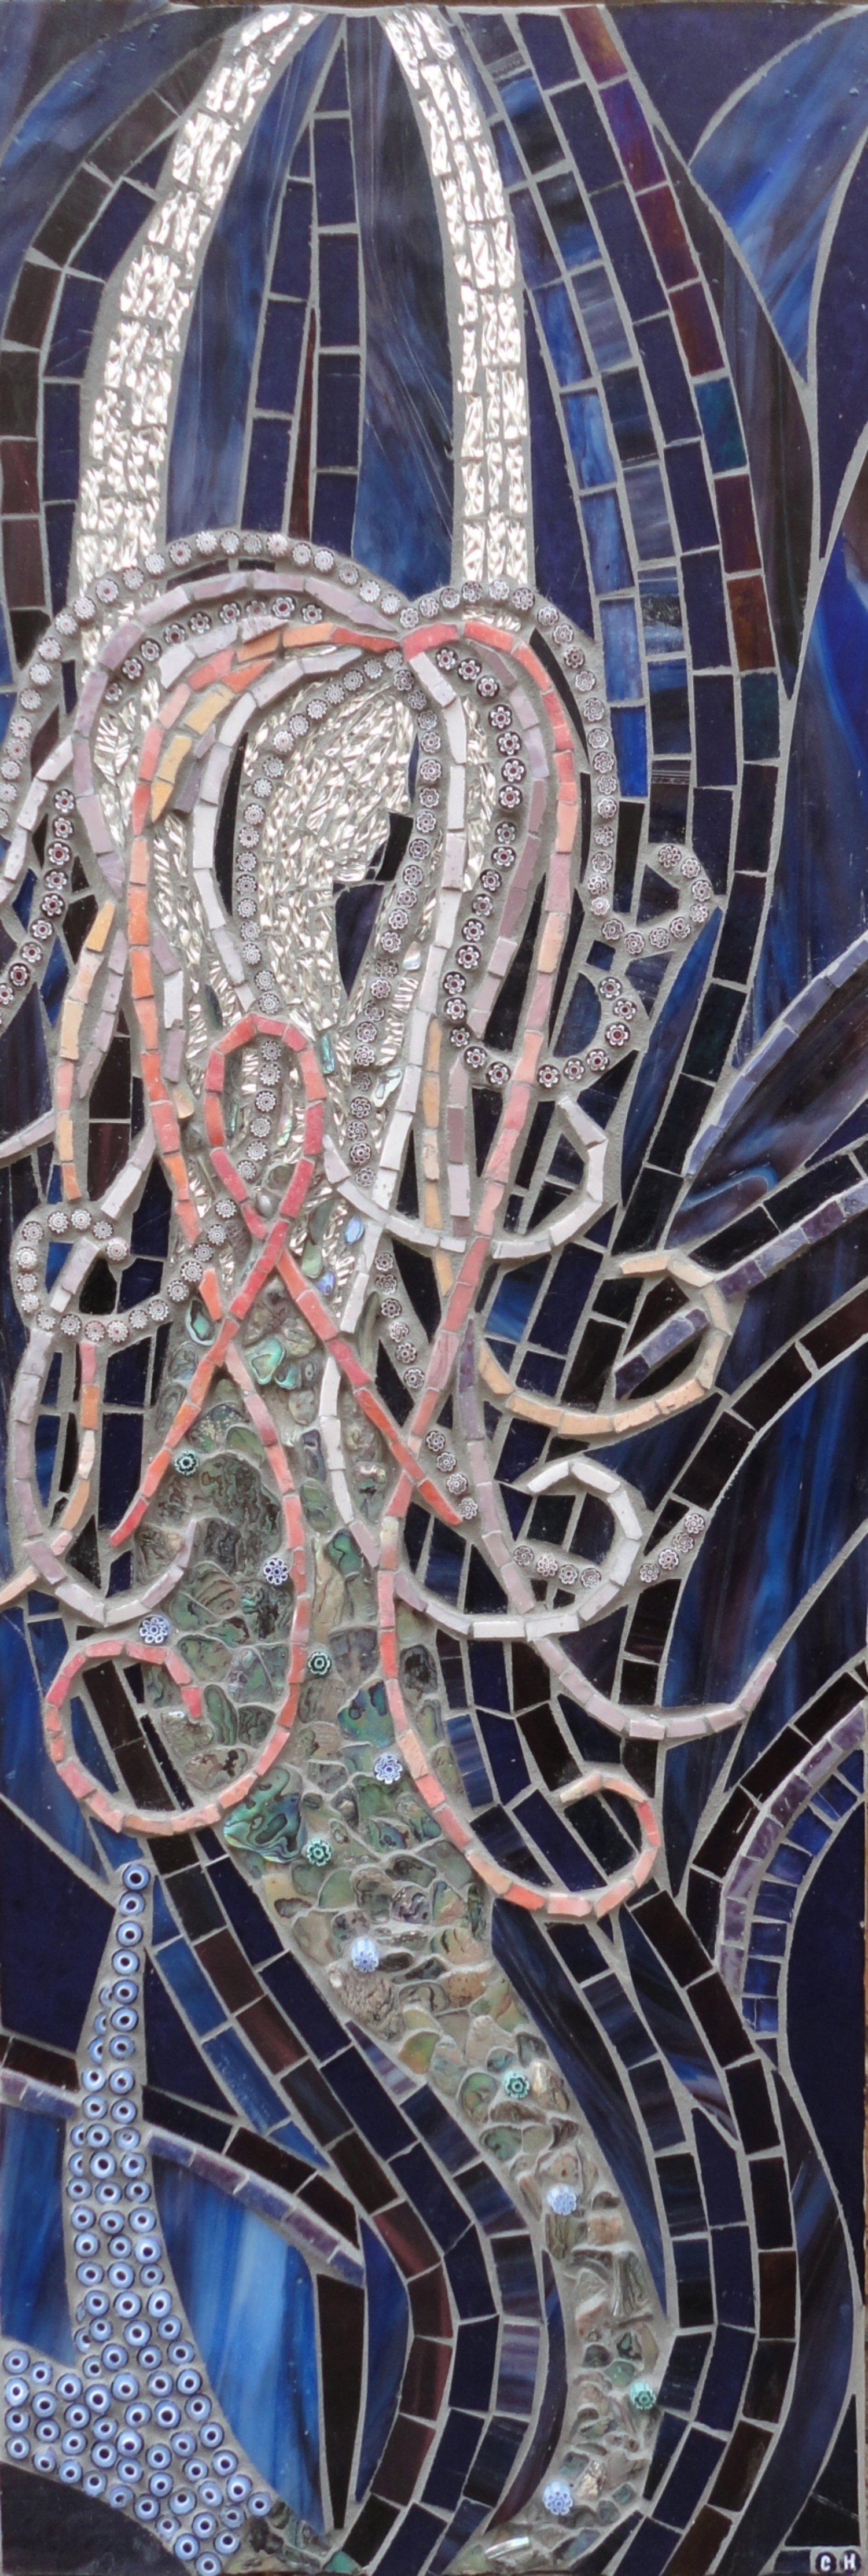 Pink Ribbon Mermaid (Smalti, Stained Glass, Mirror Glass,Paua Shell, Millefiori)